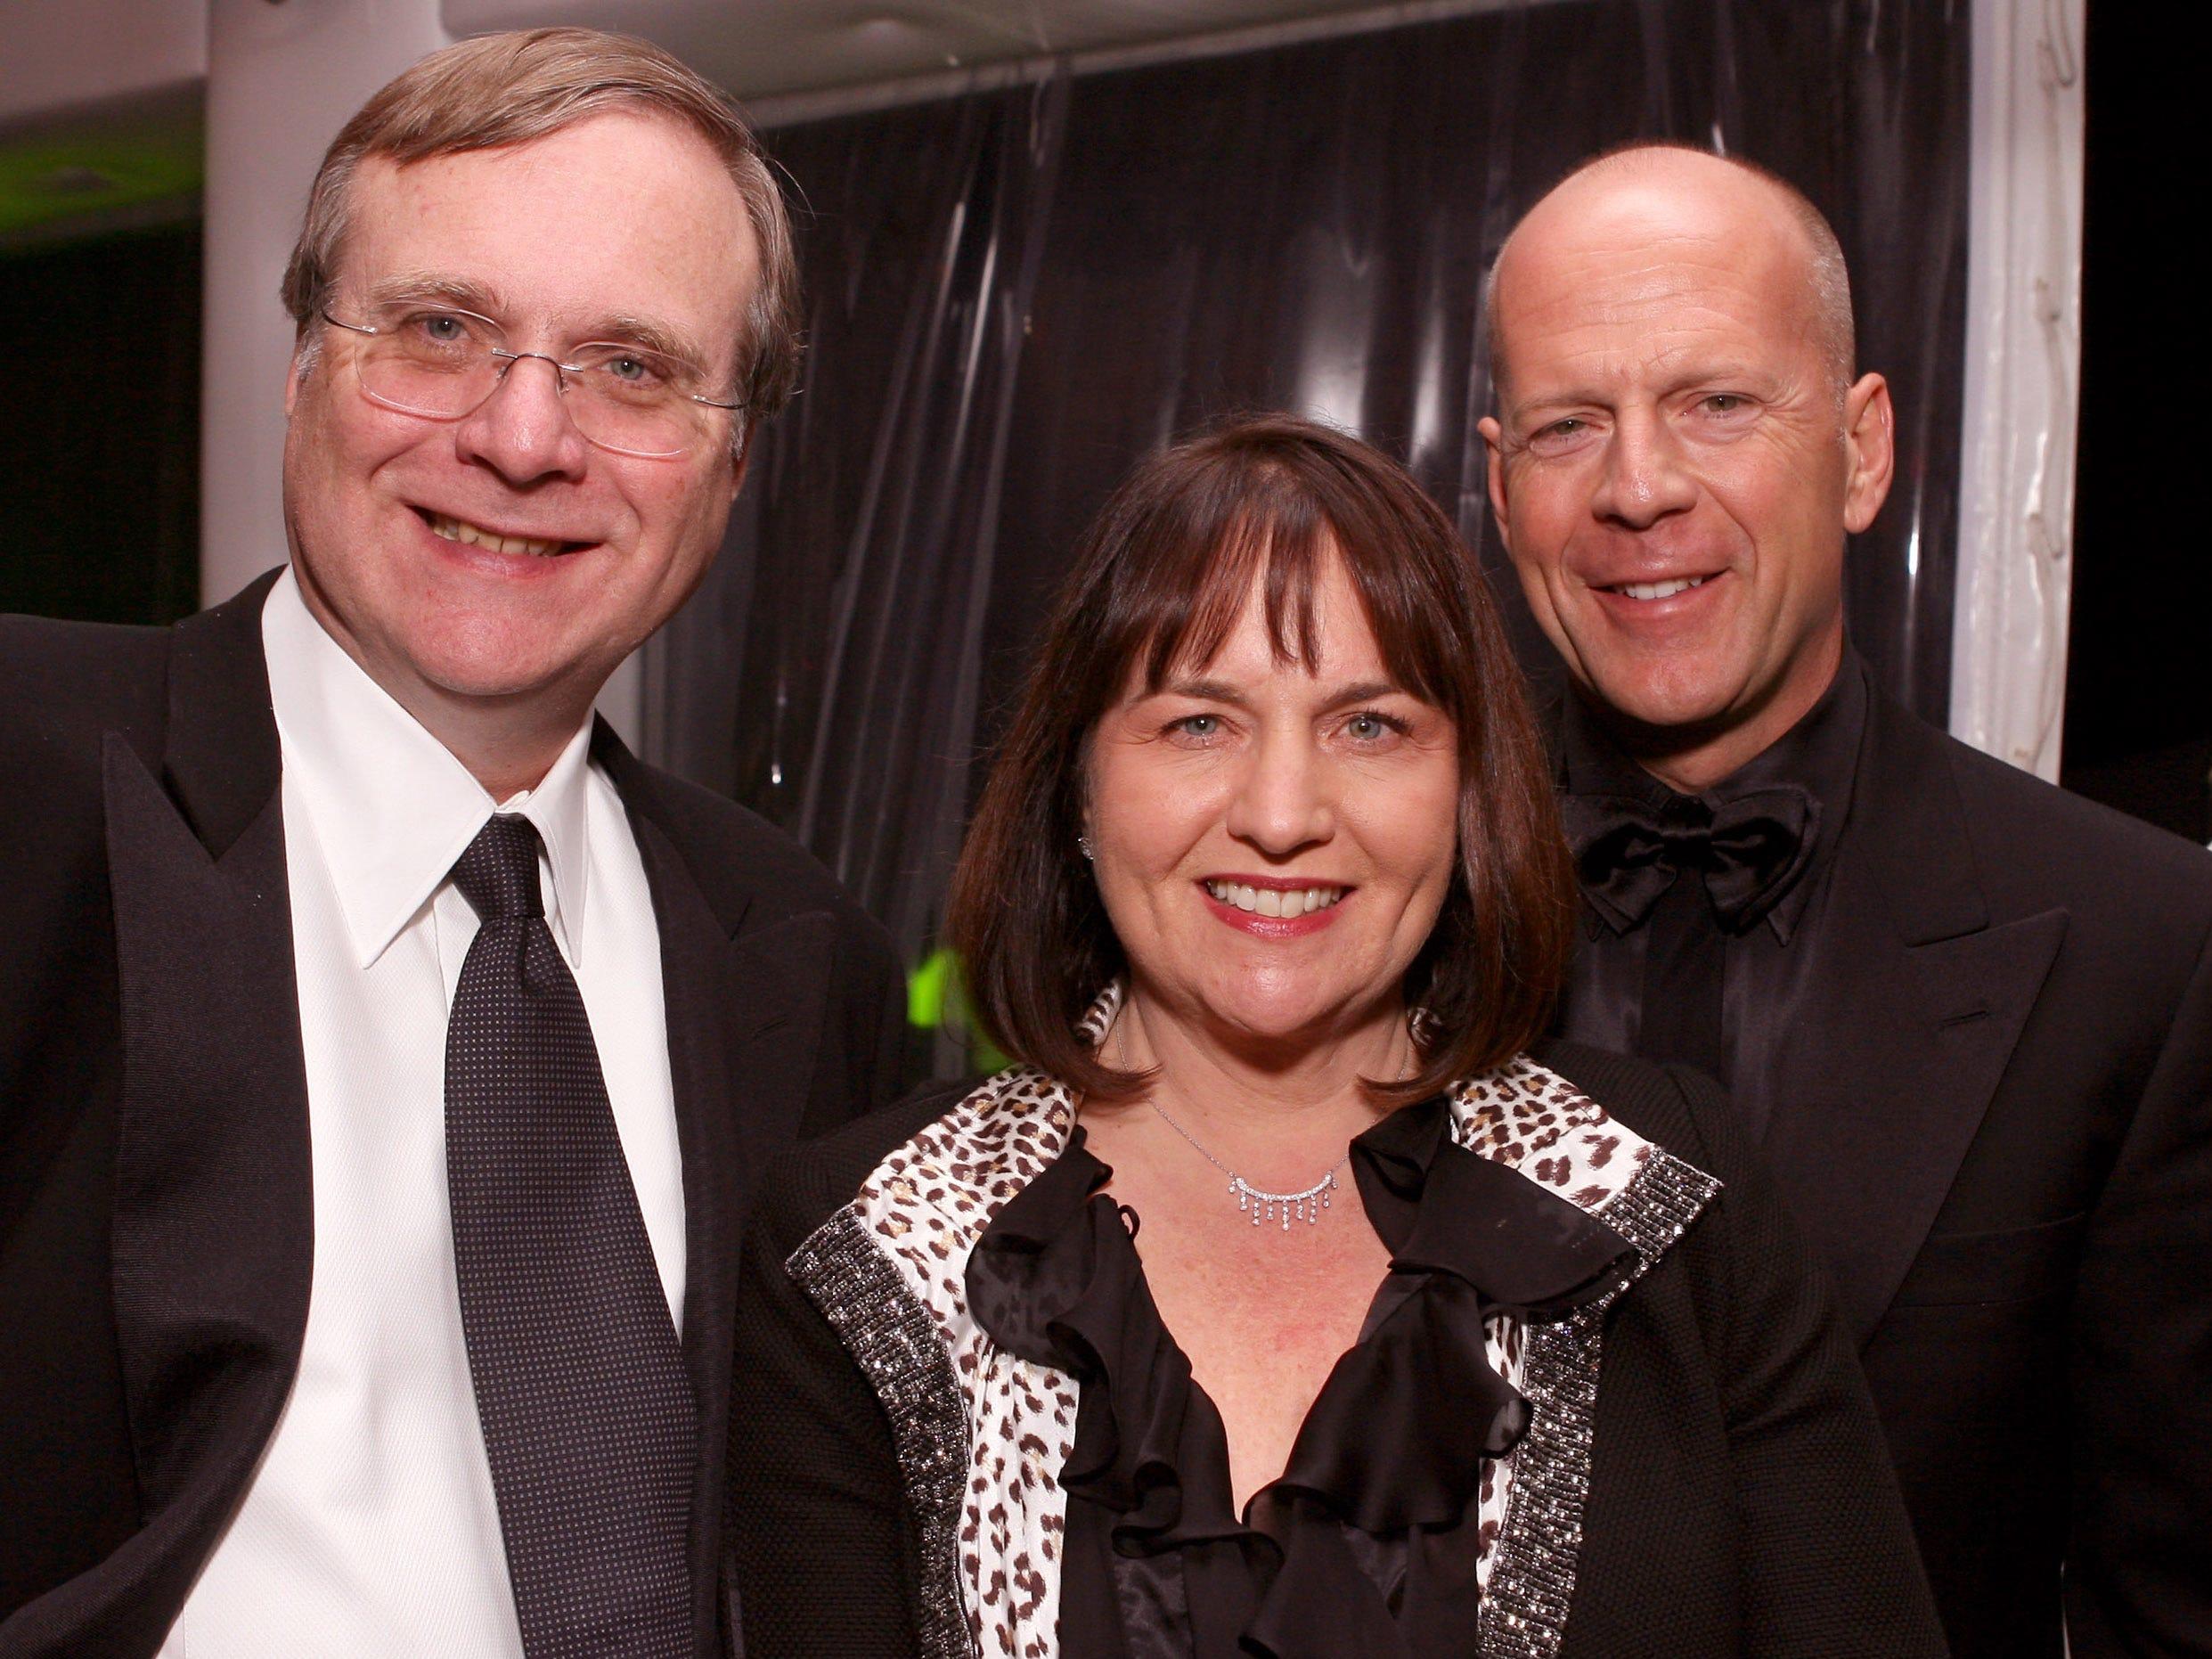 Paul Allen, left, Allen's sister, Jody Allen Patton and Bruce Willis attend the Cannes Film Festival in 2006.